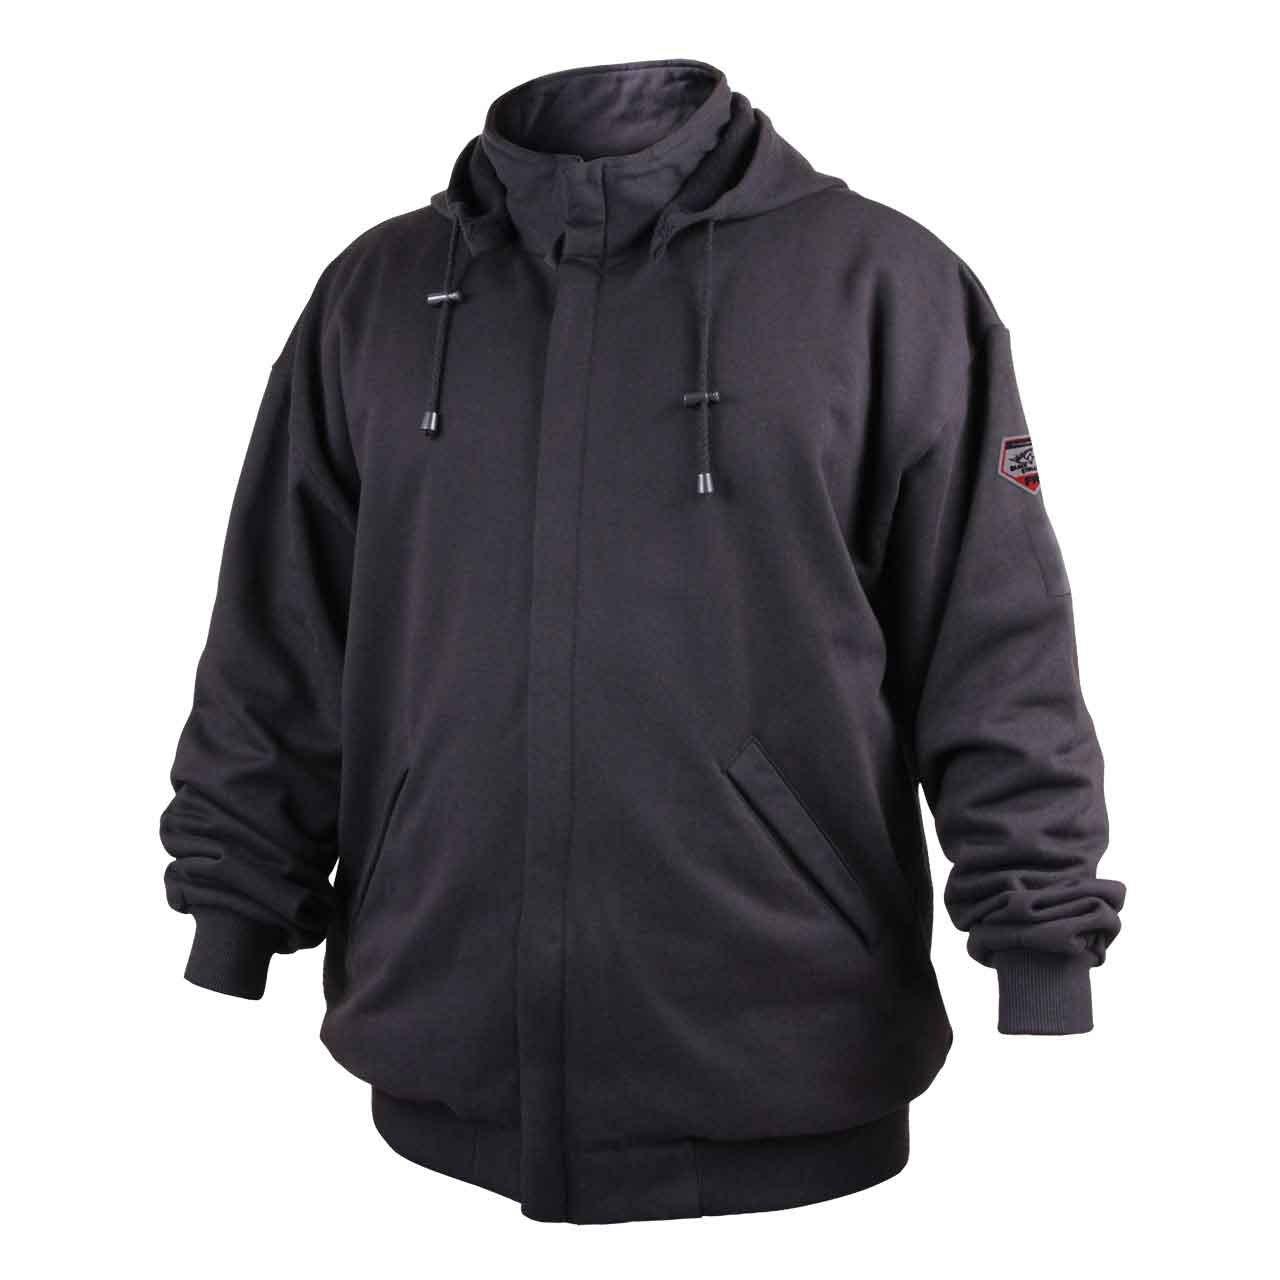 Revco/Black Stallion Truguard™ 200 Fr Cotton Black Hooded Sweatshirt Size-Med by Black Stallion